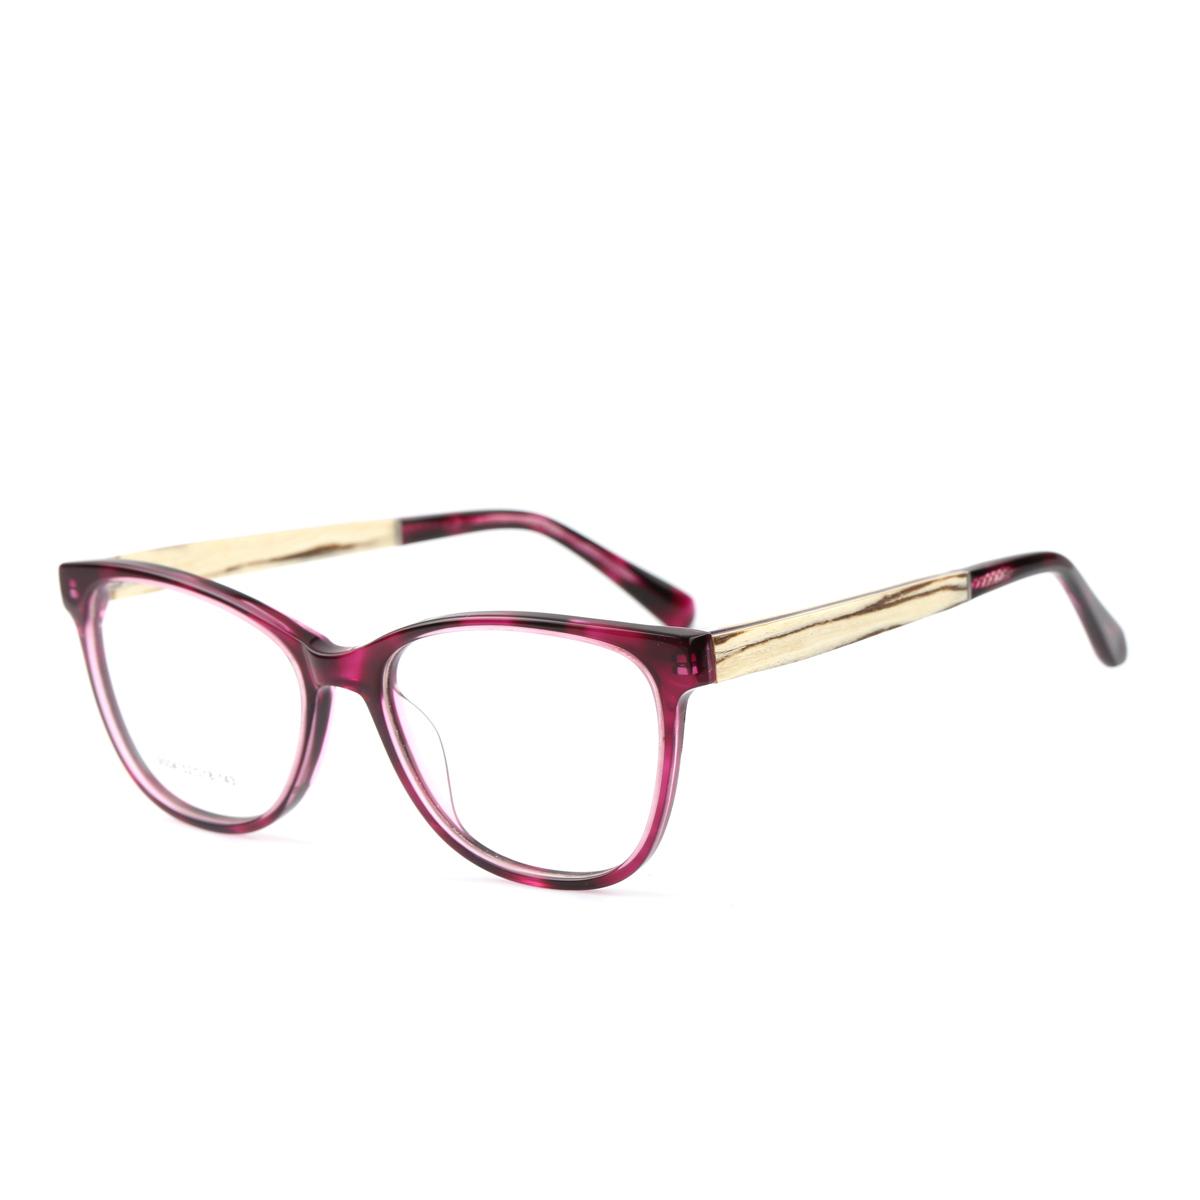 Wooden Spectacle Eyeglass(Eyewear) Frames For Wholesale-Popeyewear